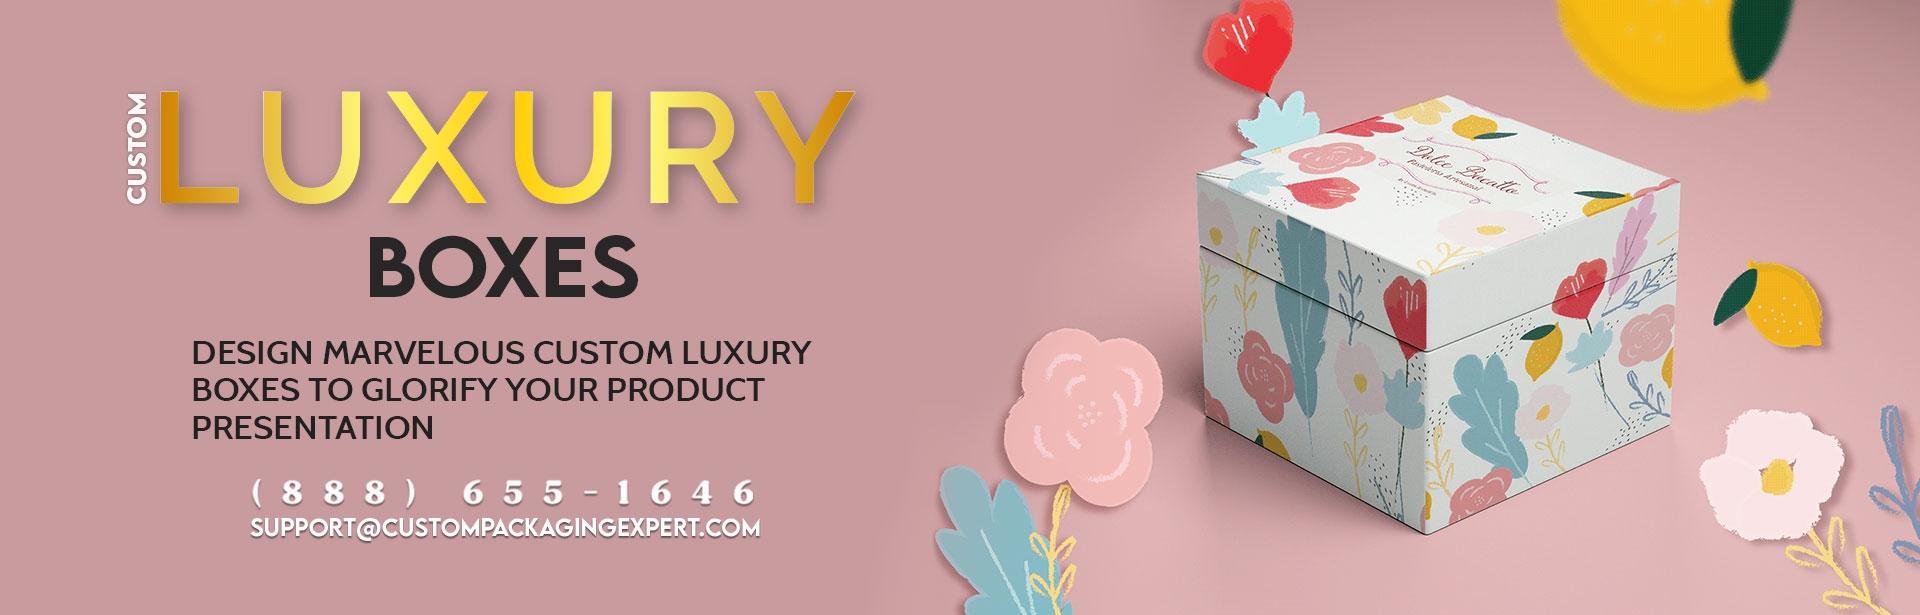 Custom Packaging Expert (@custompackagingexpert) Cover Image